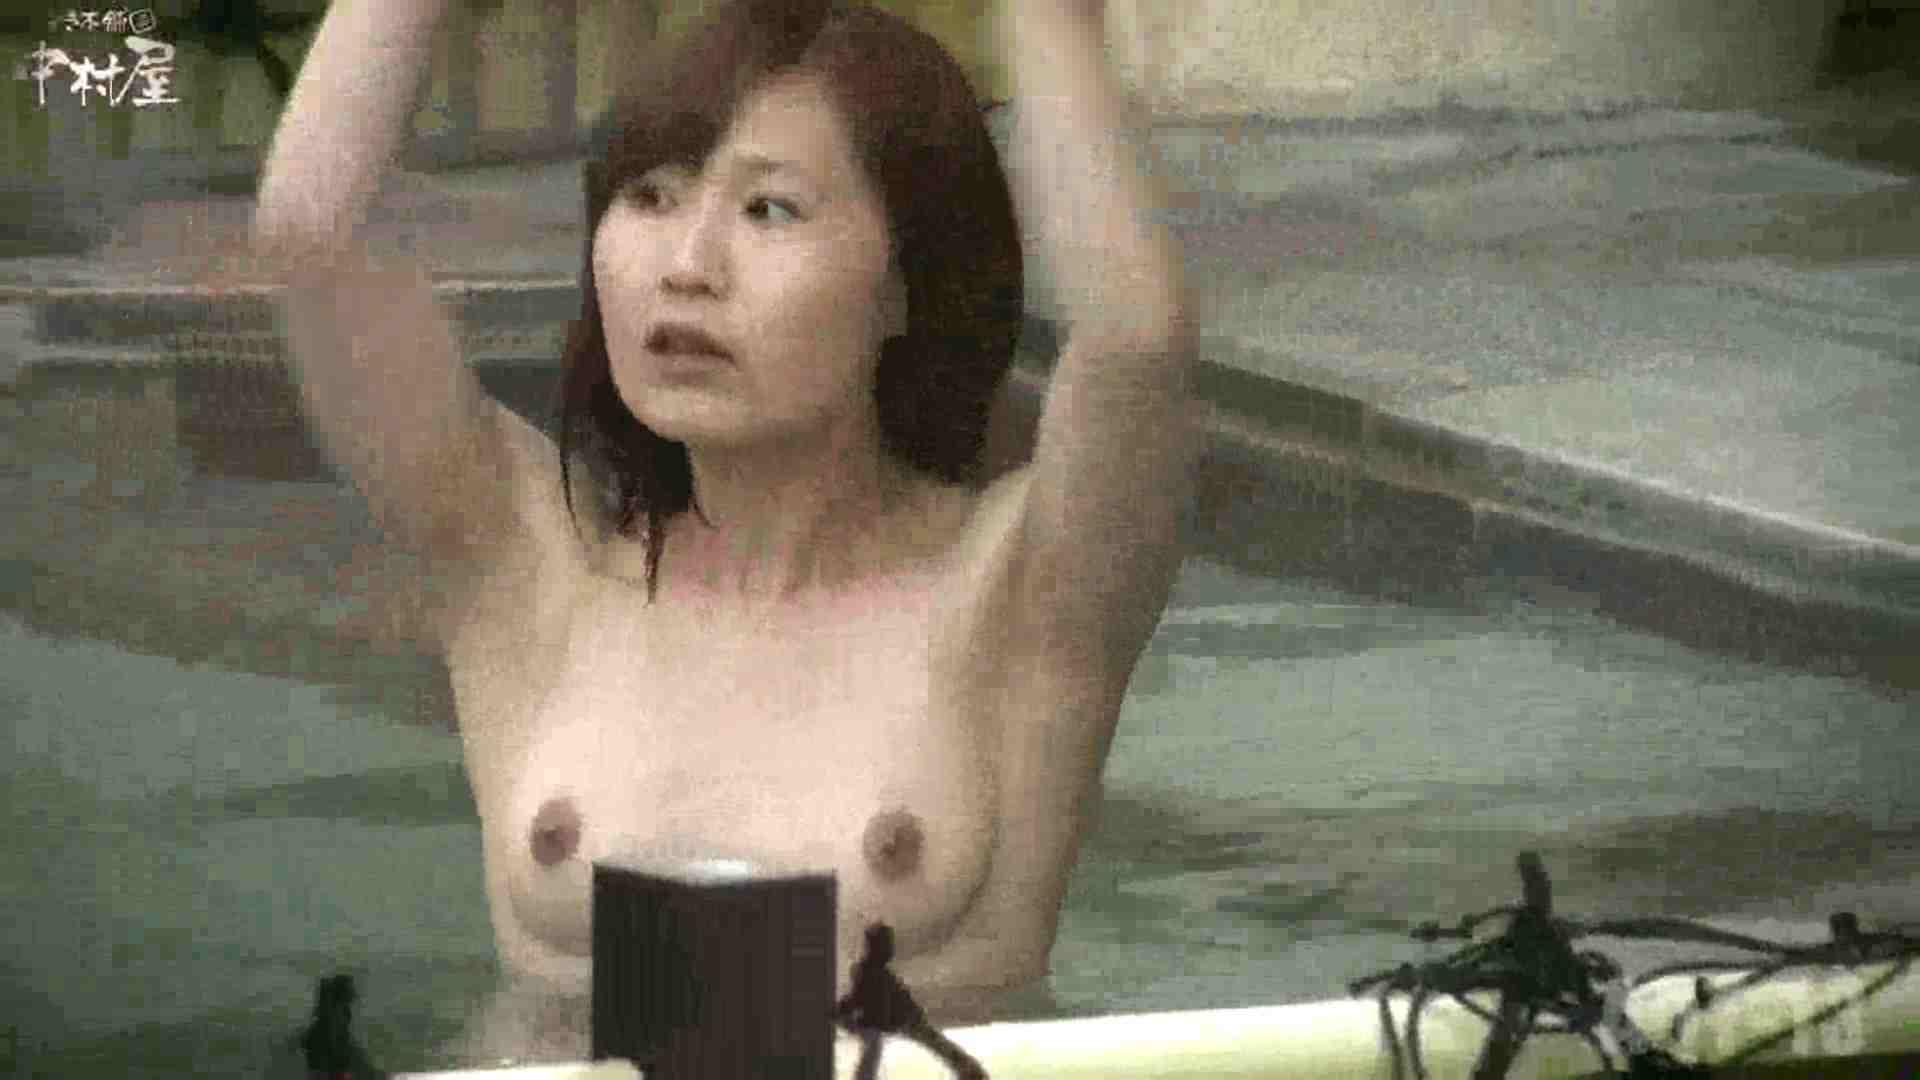 Aquaな露天風呂Vol.877潜入盗撮露天風呂十三判湯 其の二 美しいOLの裸体 セックス無修正動画無料 97pic 6